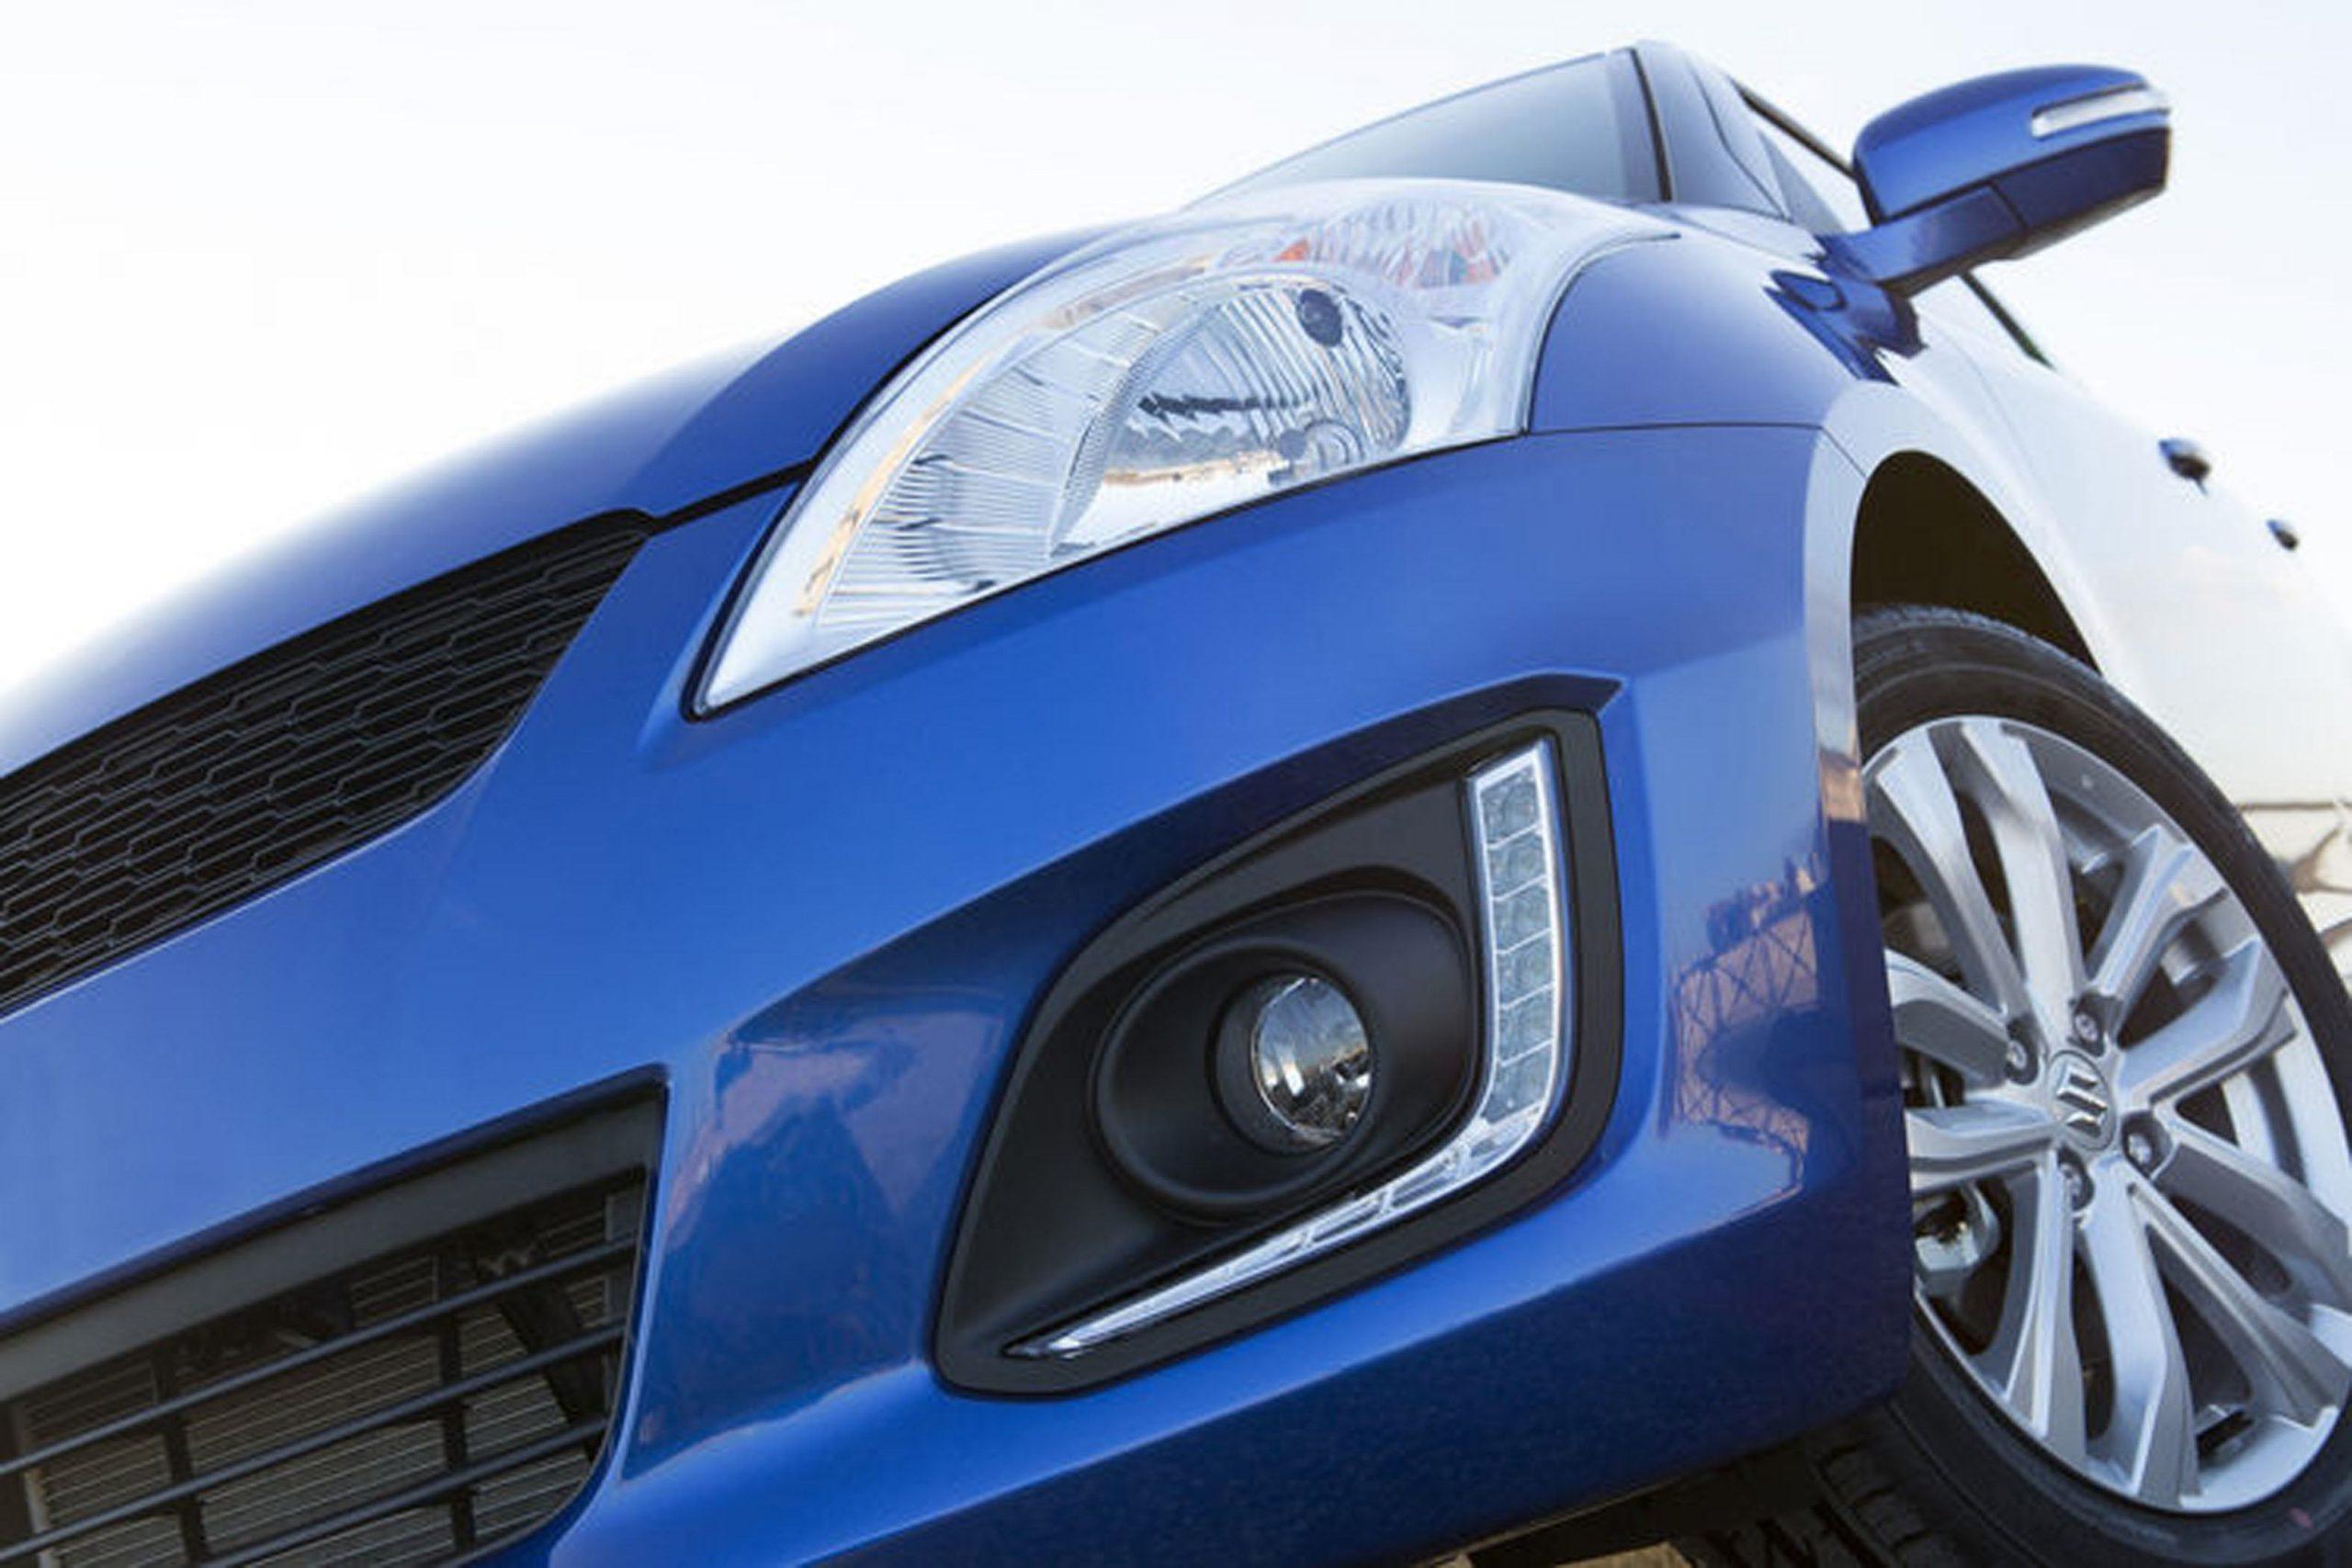 Suzuki Swift Tweaked: Latest News – Surf4cars